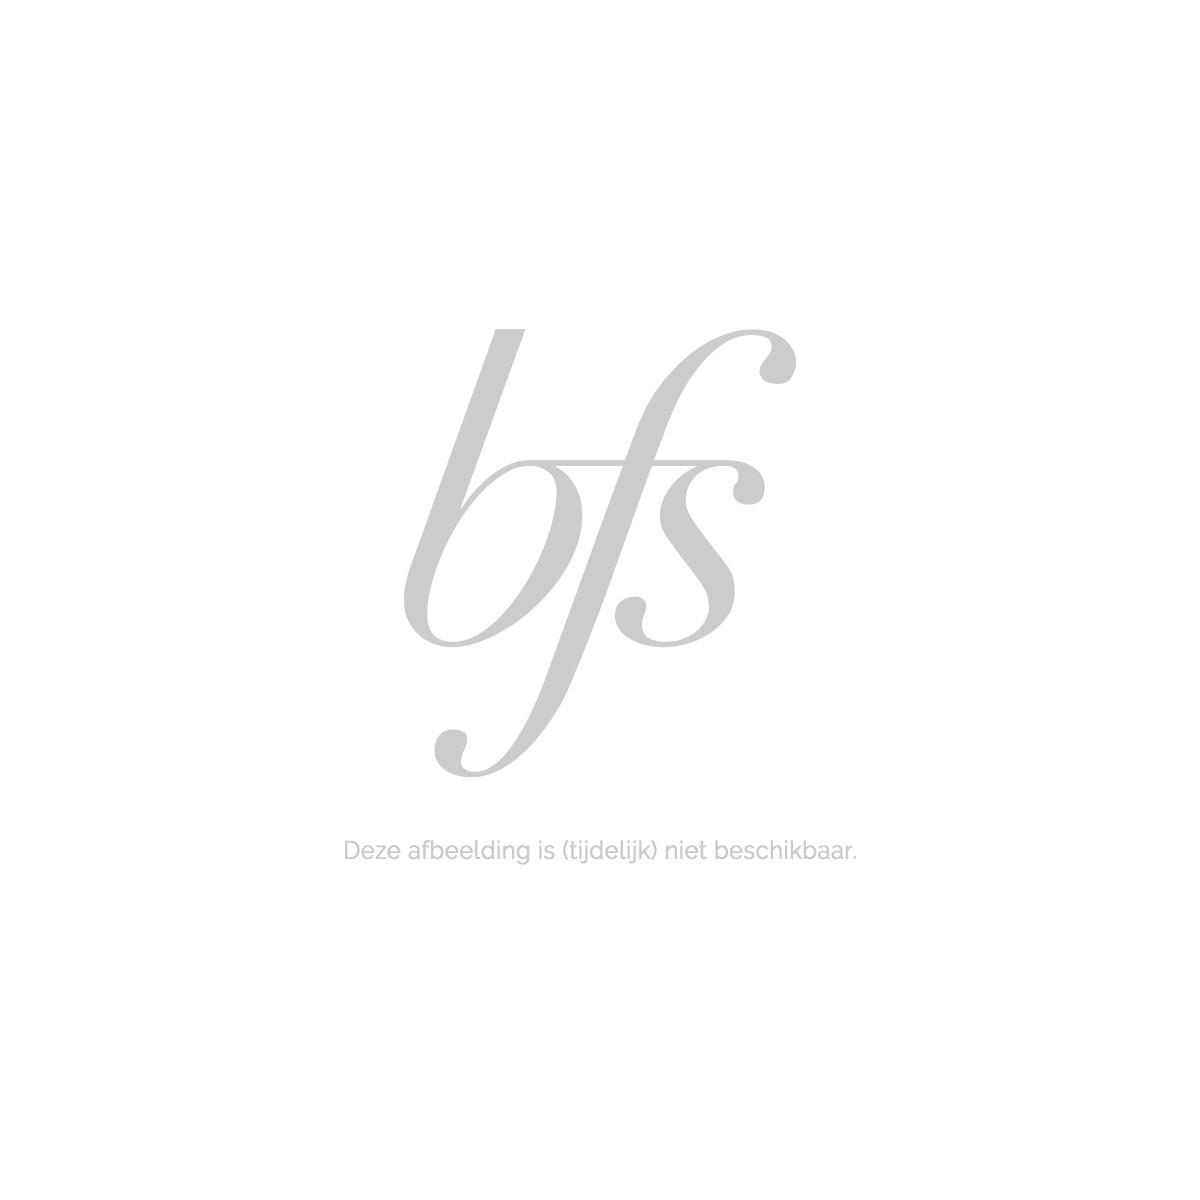 Chanel Beaute Des Cils Mascara Base